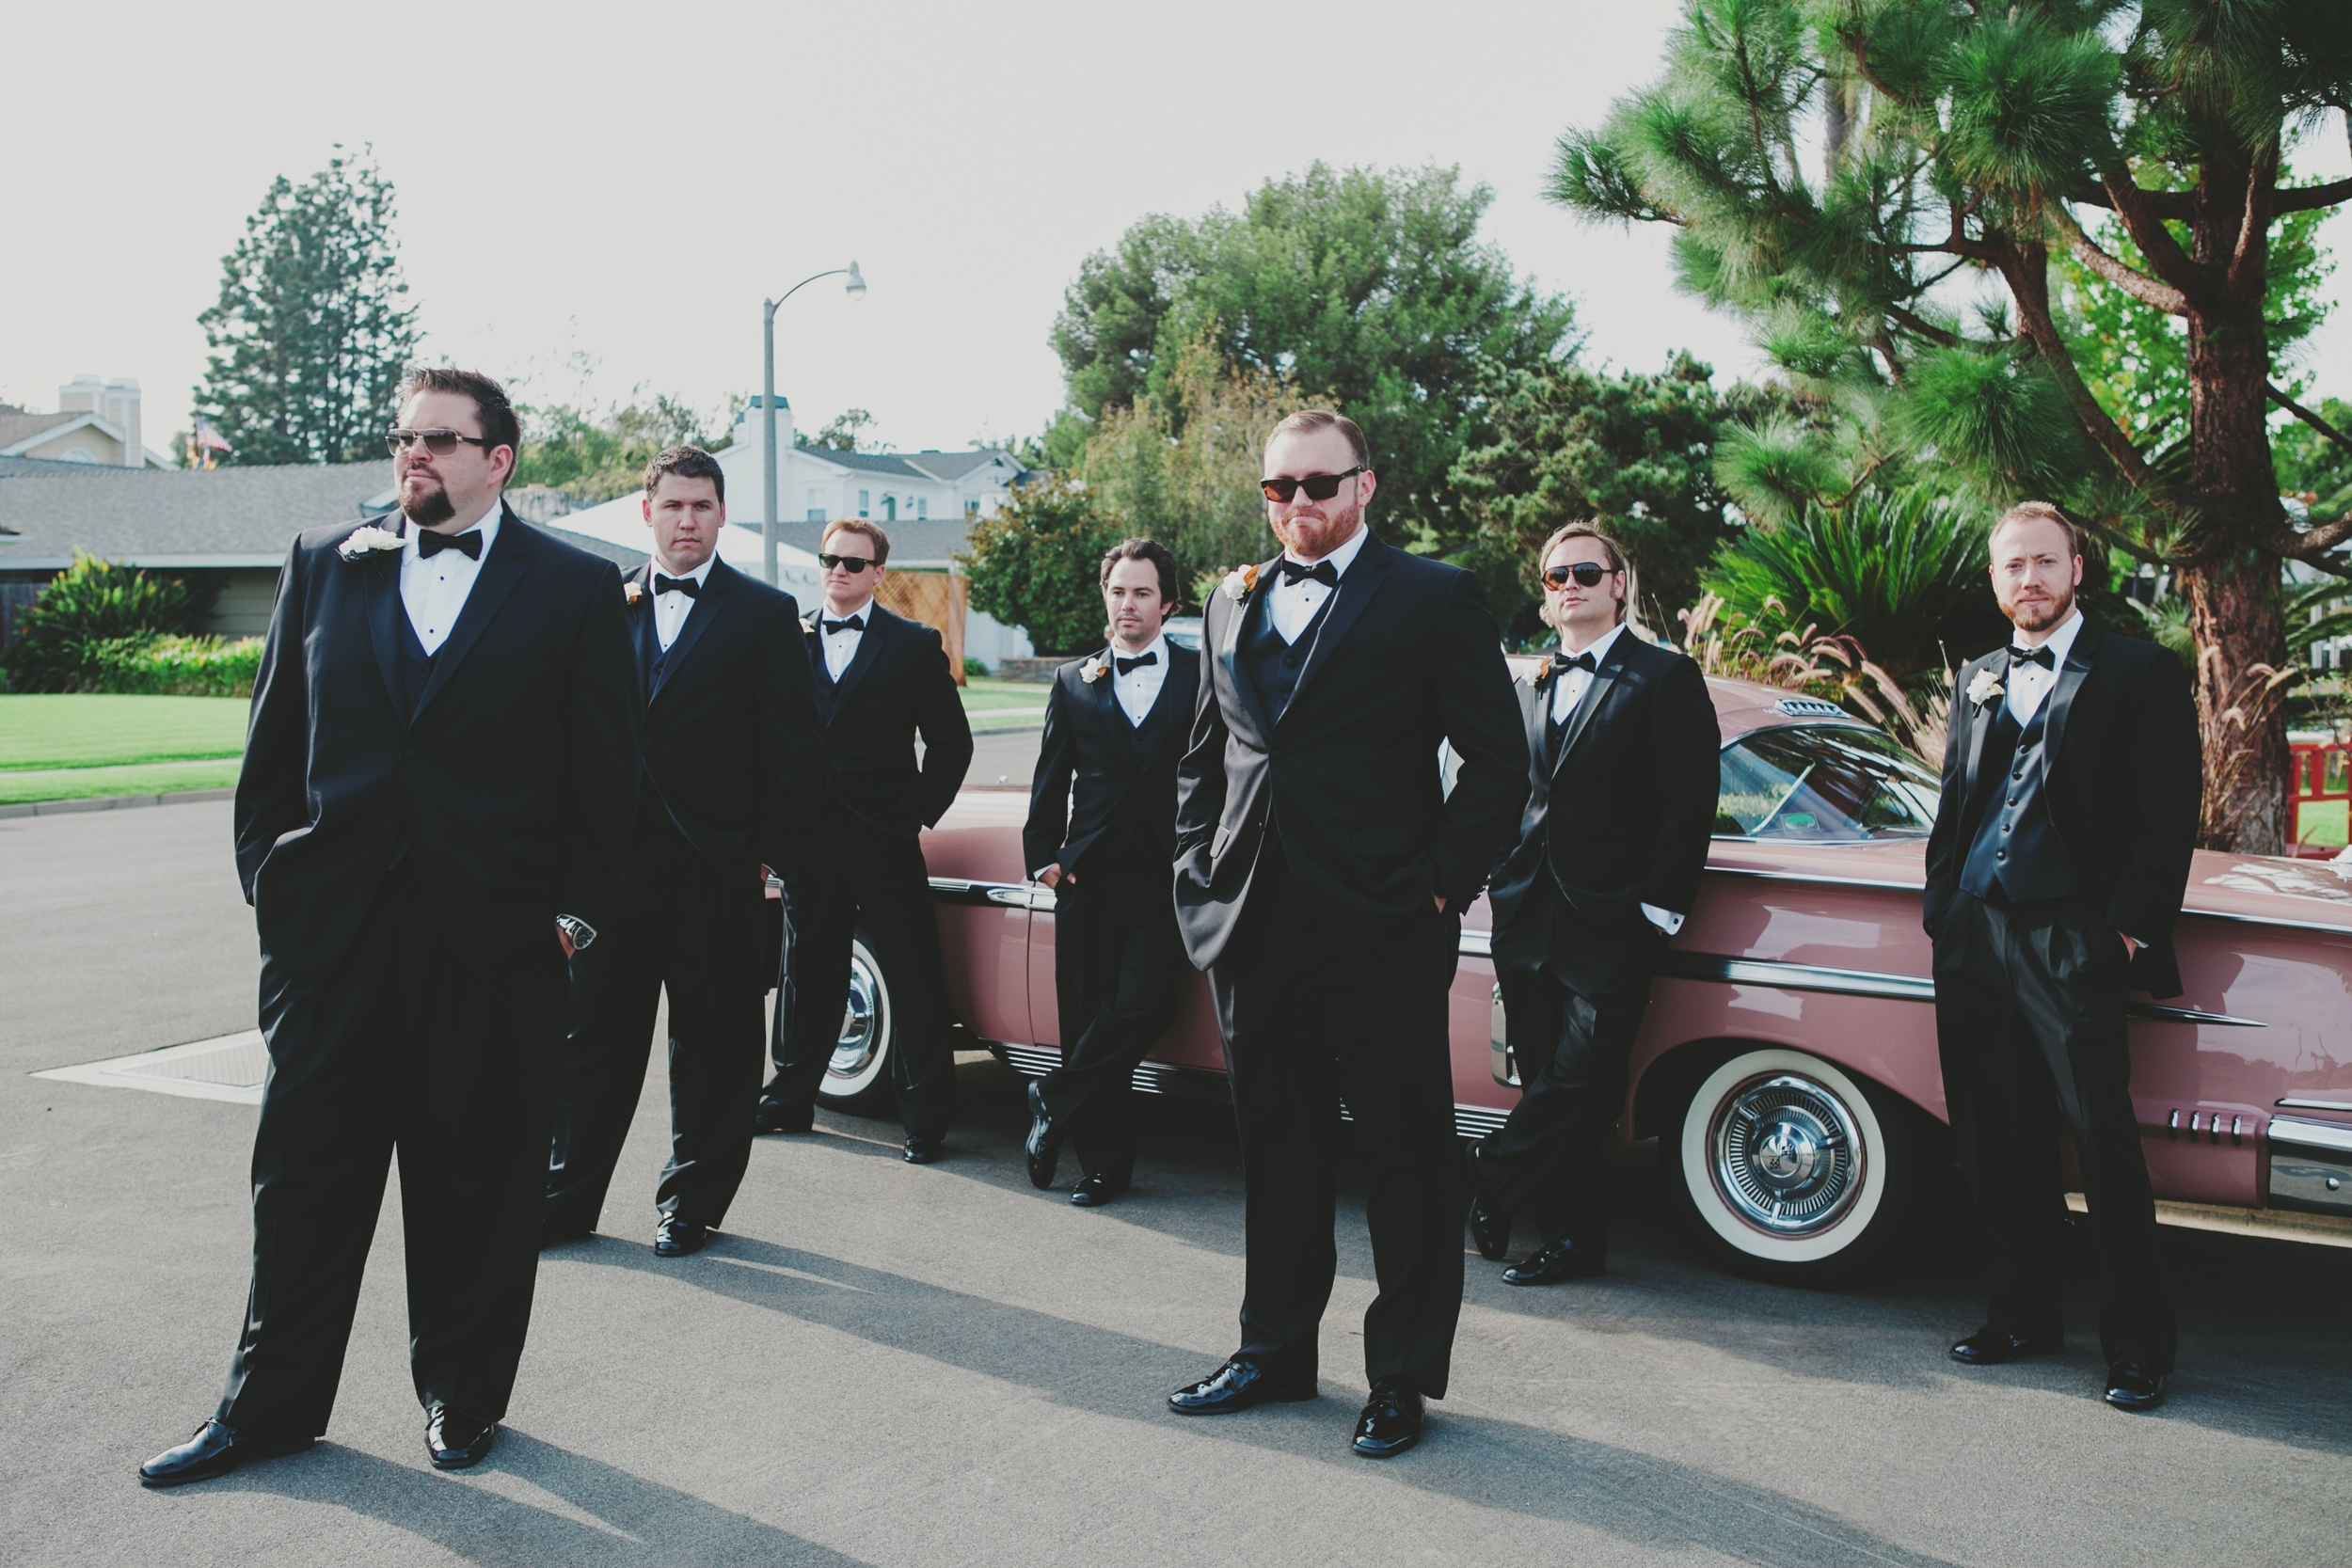 The-Suitcase-Studio-Timree-Matt-Lifestyle-Wedding-Photographer-017.jpg